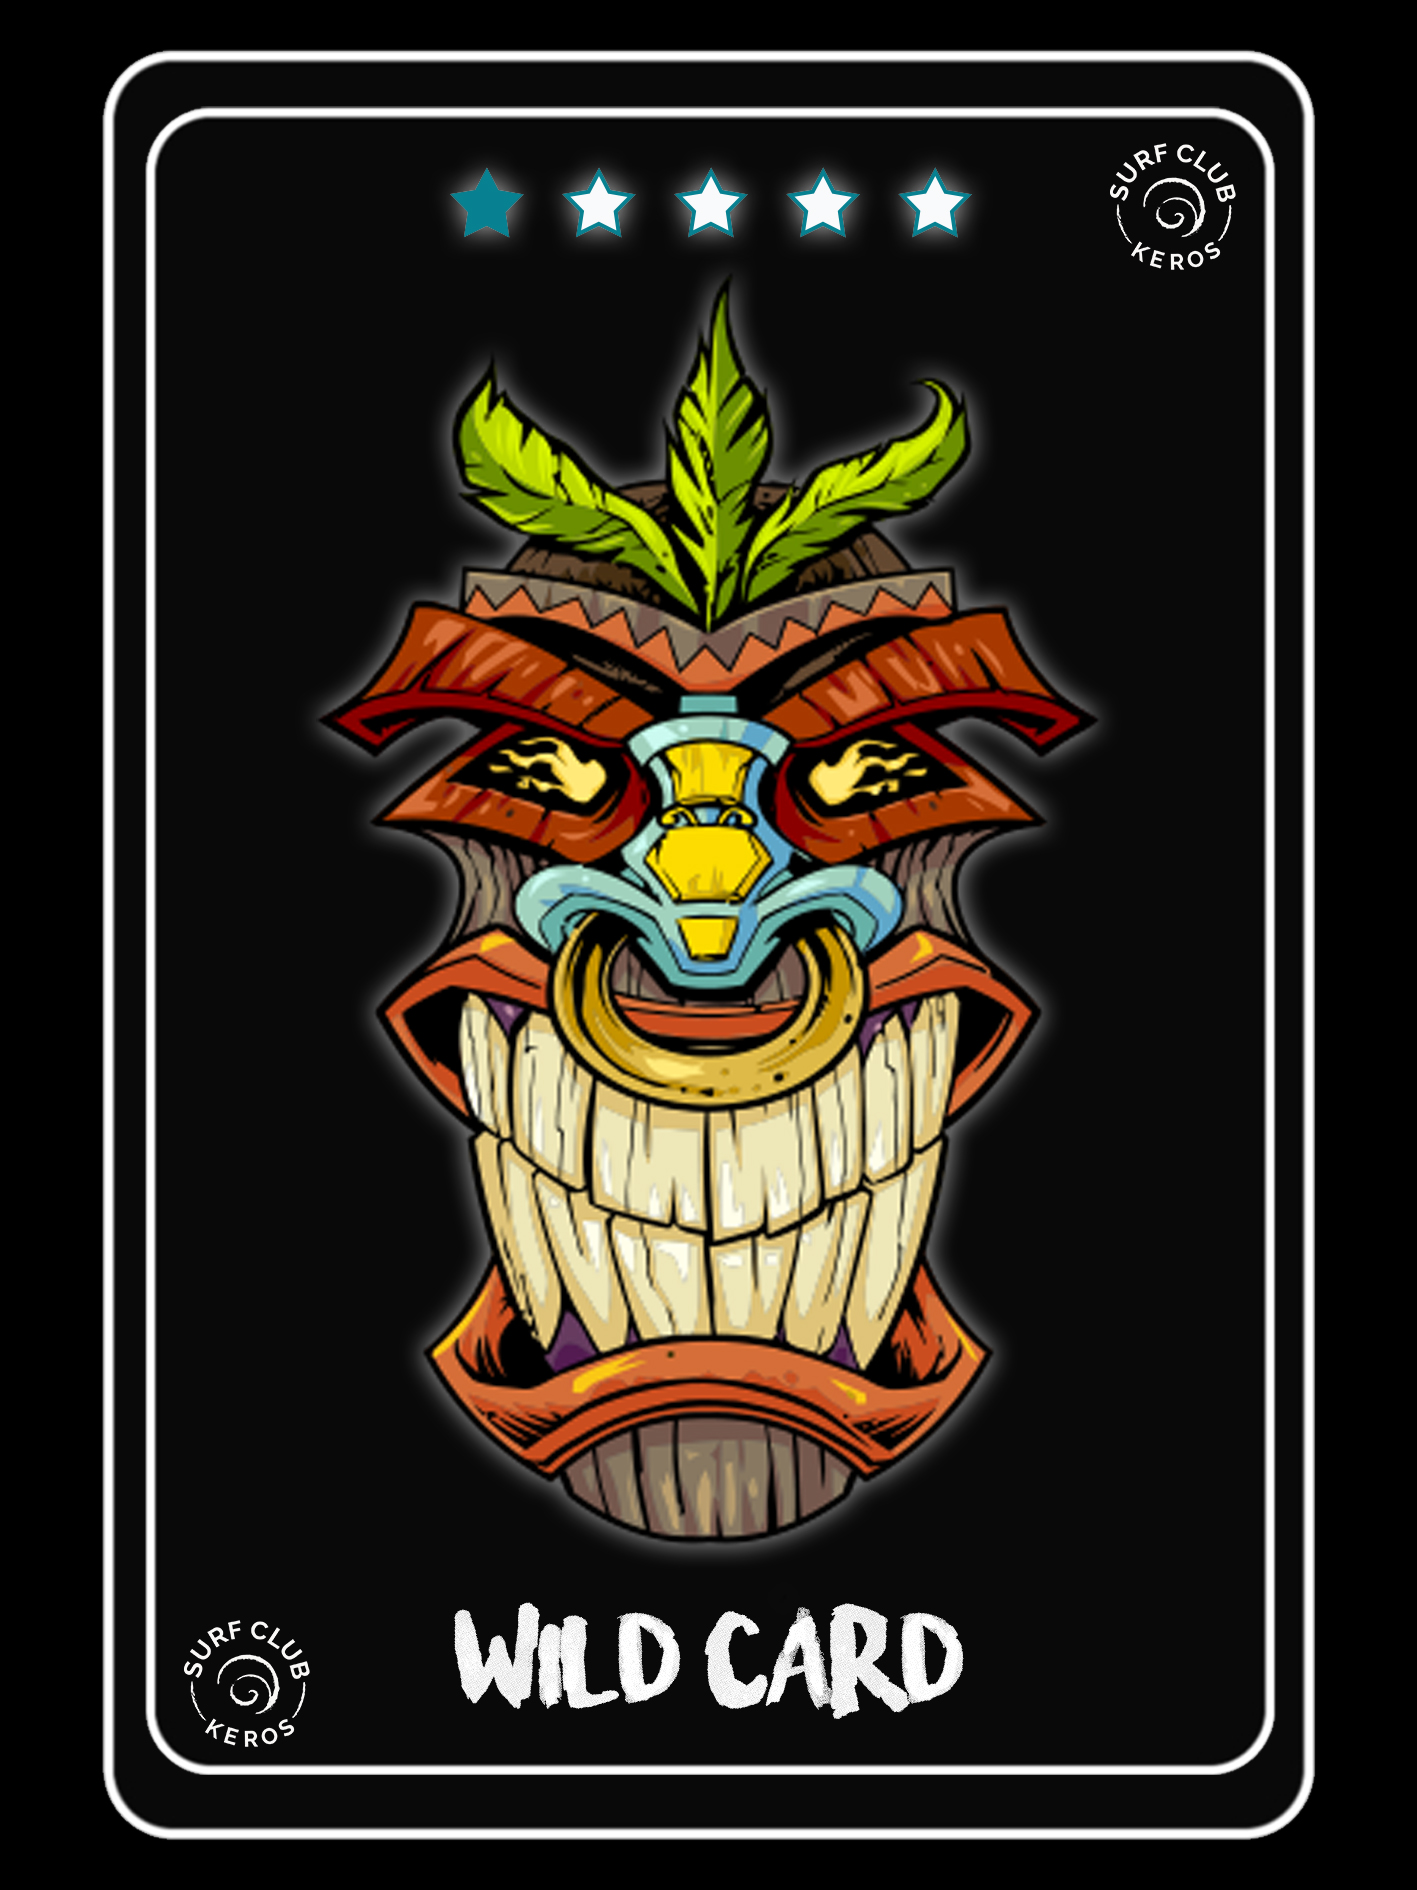 WILD CARDS BANNER with wild tiki mask